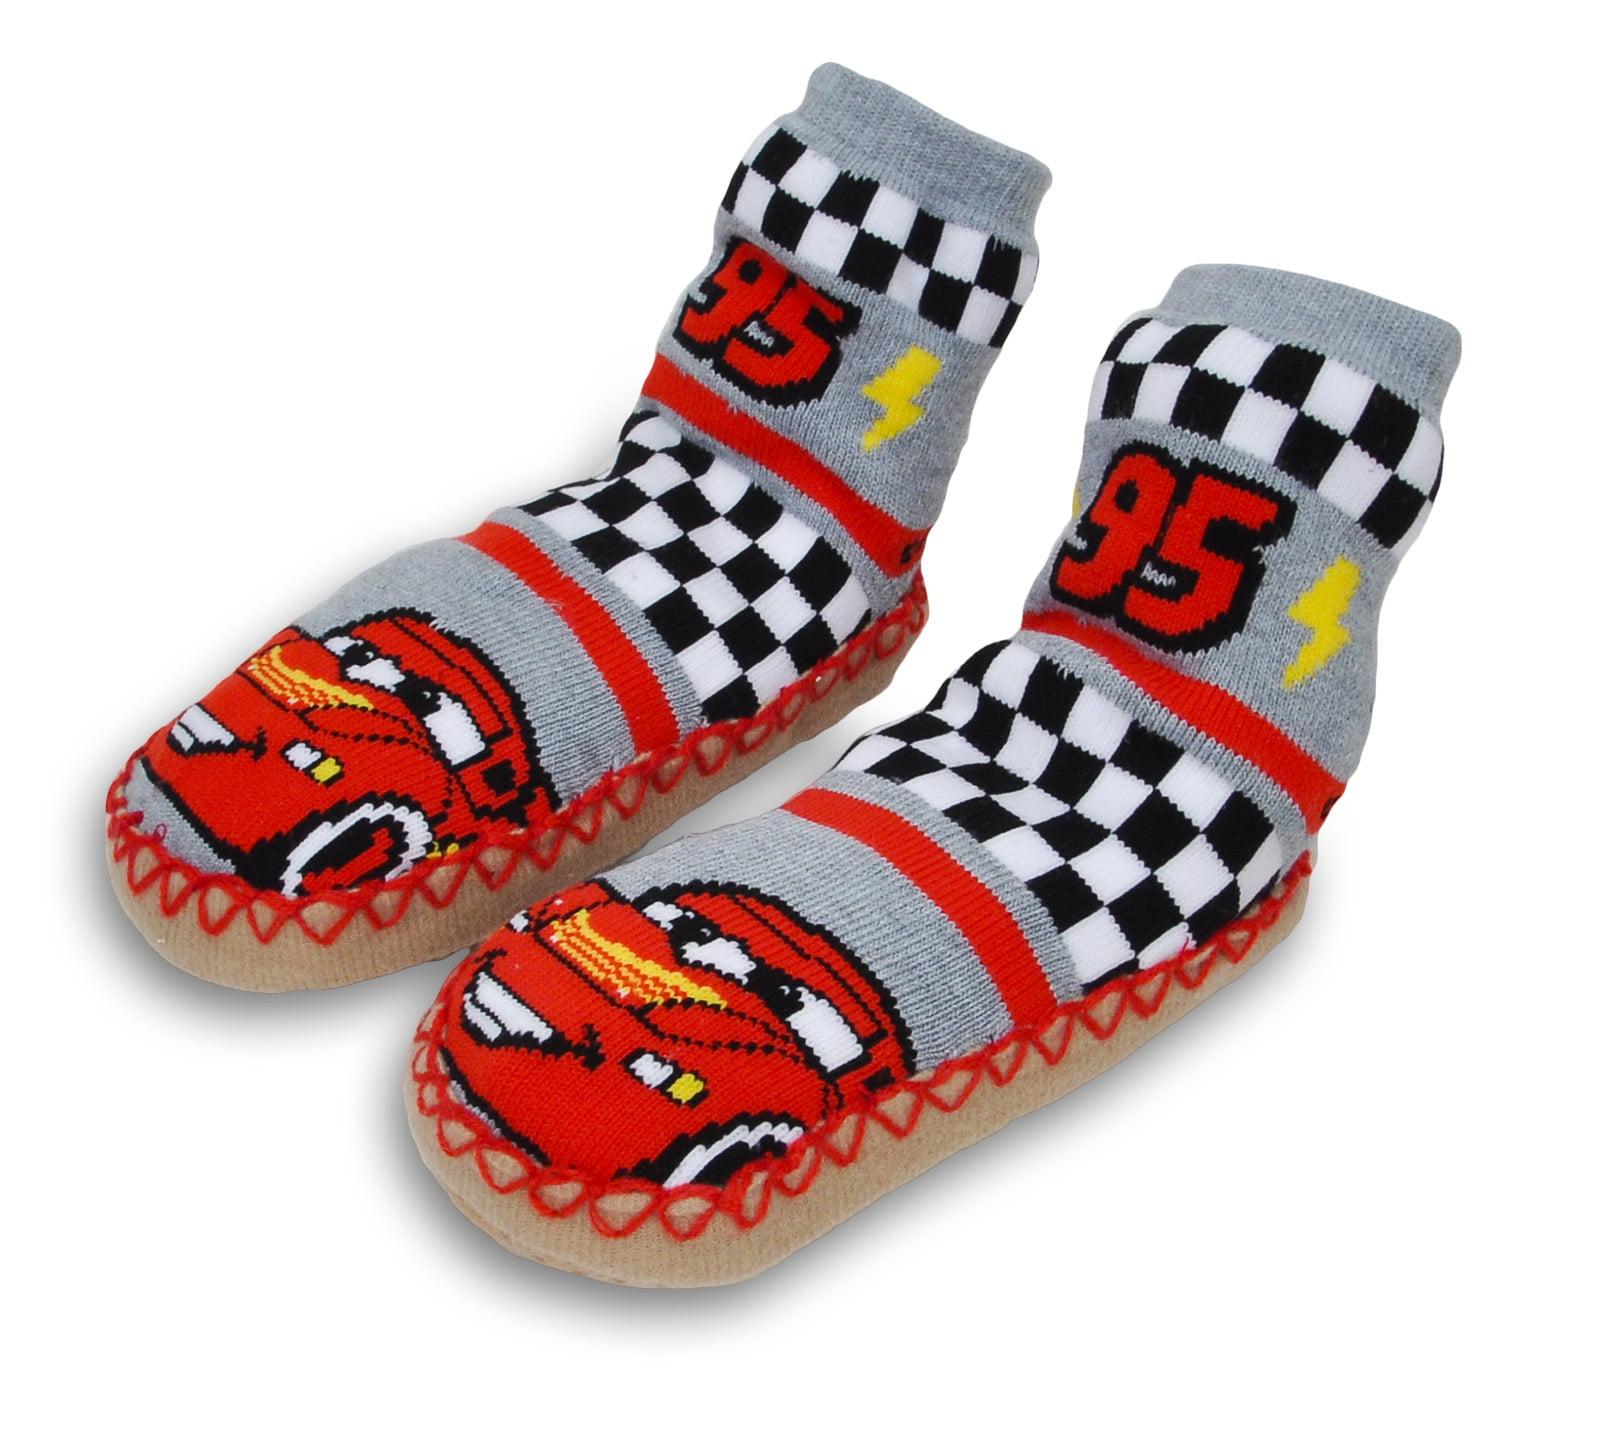 Disney Cars 3 Toddler Boys Fuzzy Slipper Socks Fits Shoe Size 8-10 Red